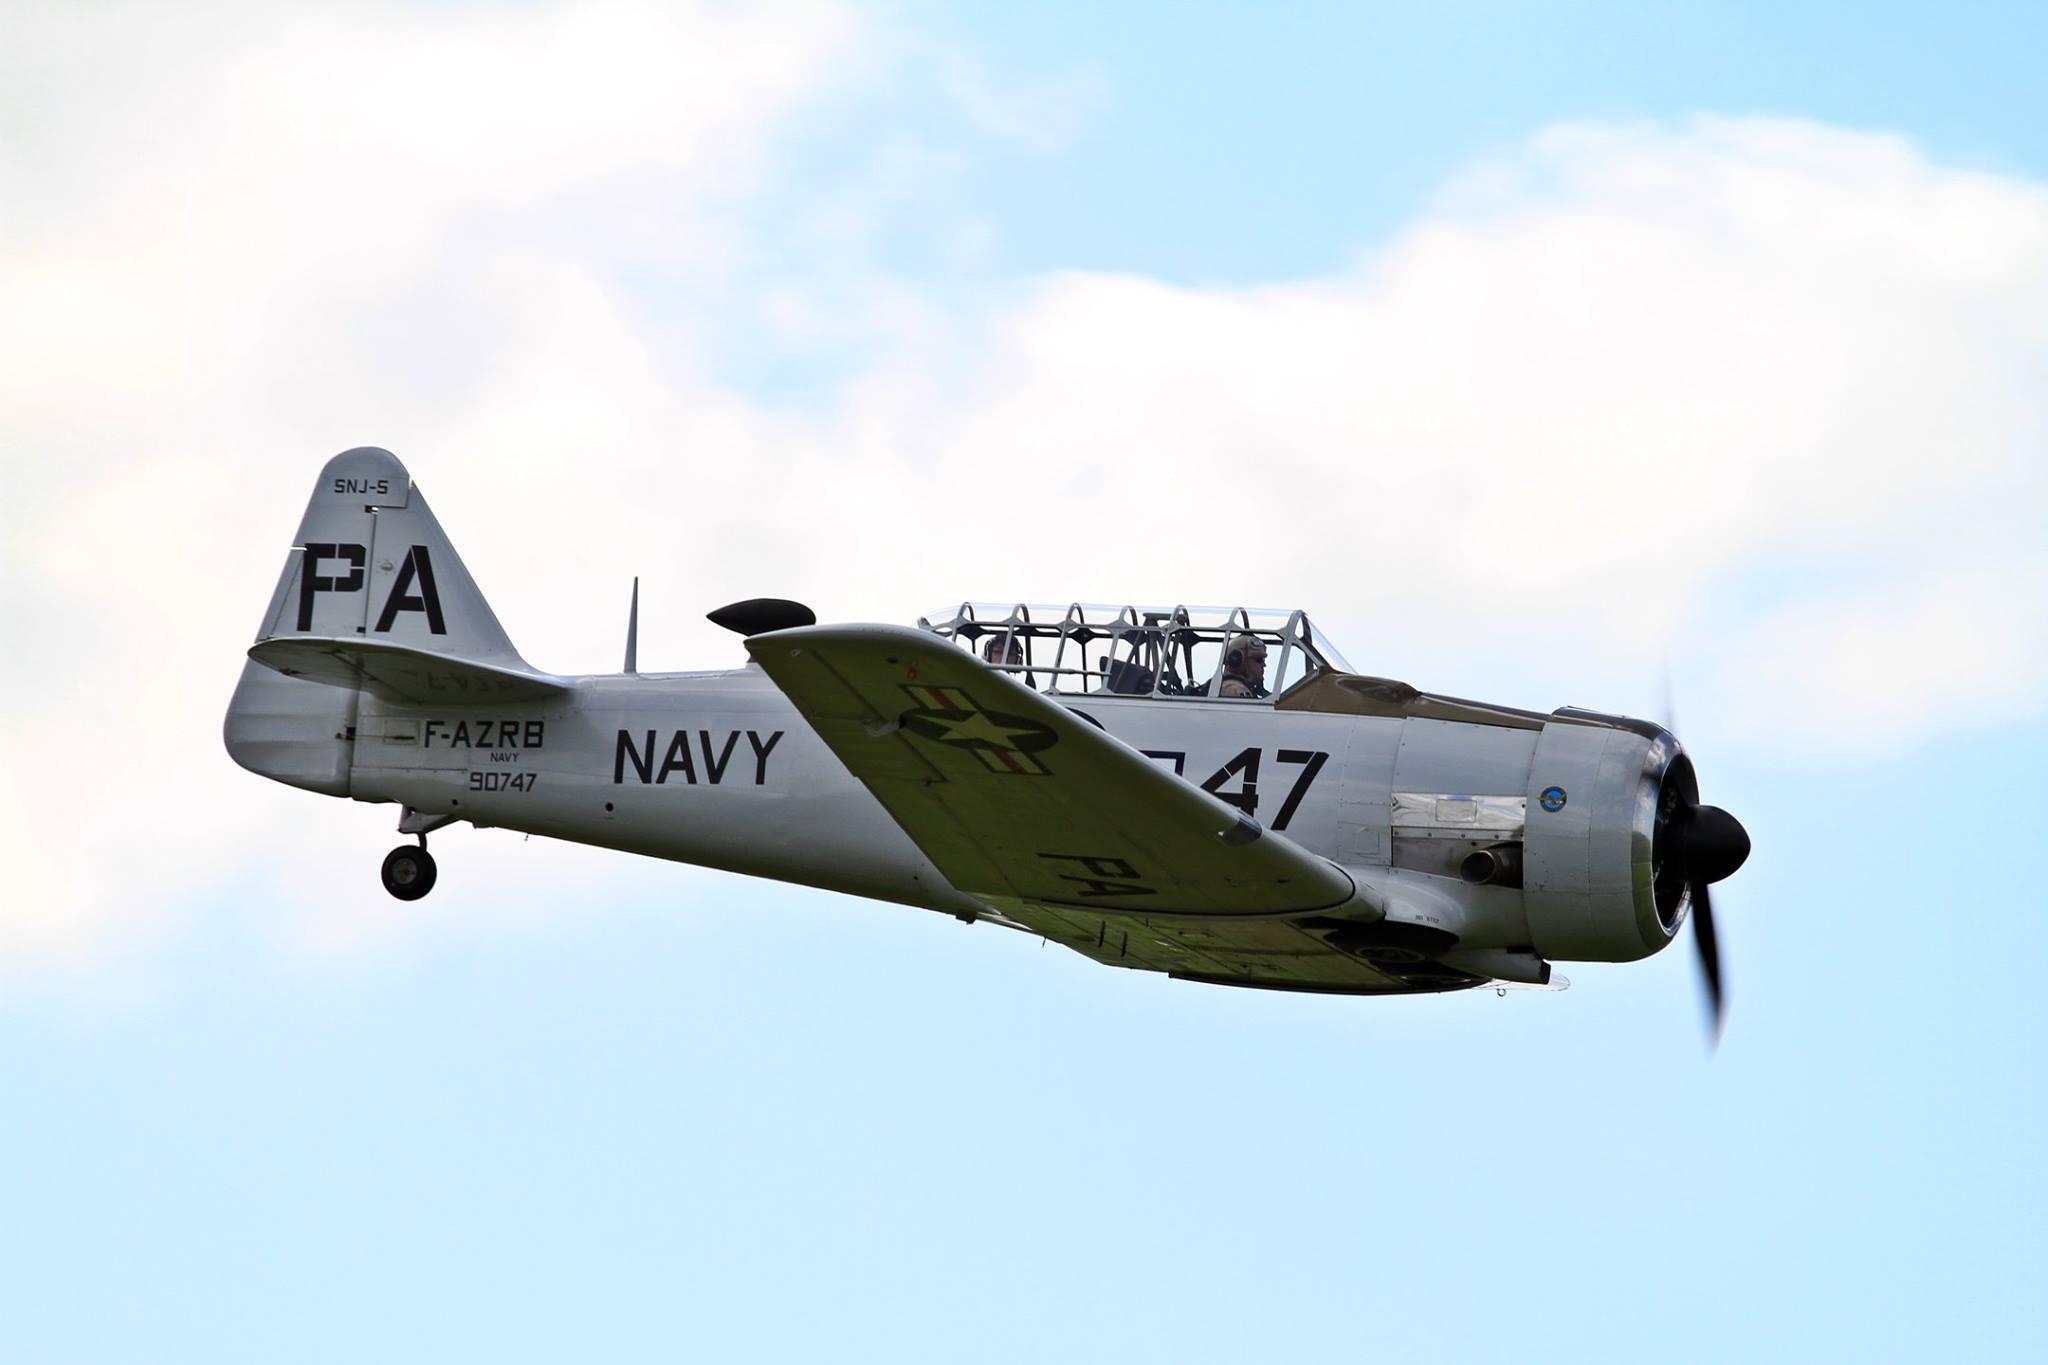 0009 P47 Thunderbolt 79TH MEMORY GROUP